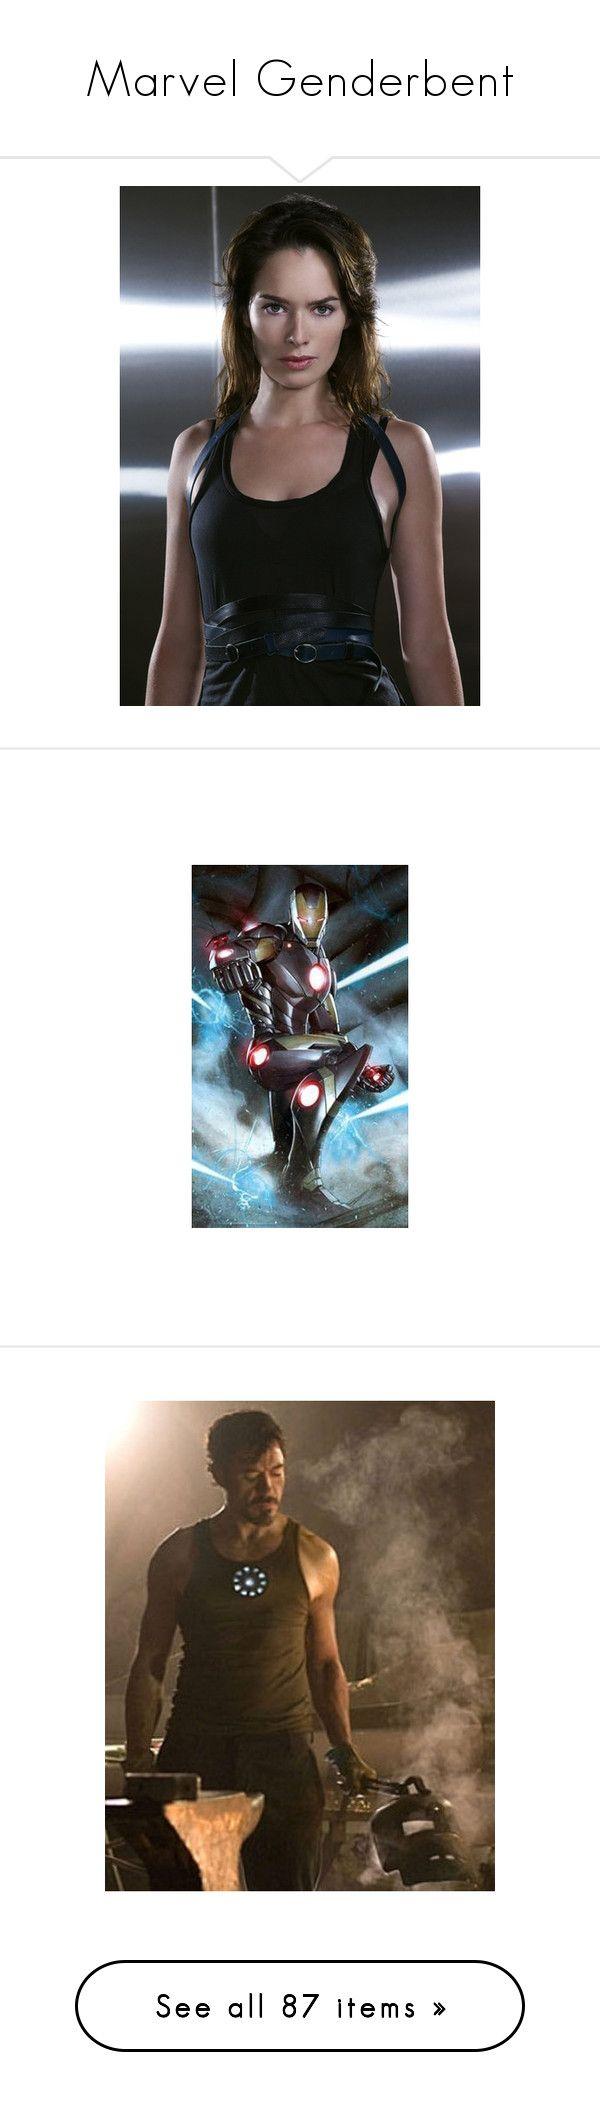 """Marvel Genderbent"" by angeltomlinson ❤ liked on Polyvore featuring lena headey, marvel, avengers, natalie dormer, chris evans, pictures, captain america, art, celebrities and marvel thor"